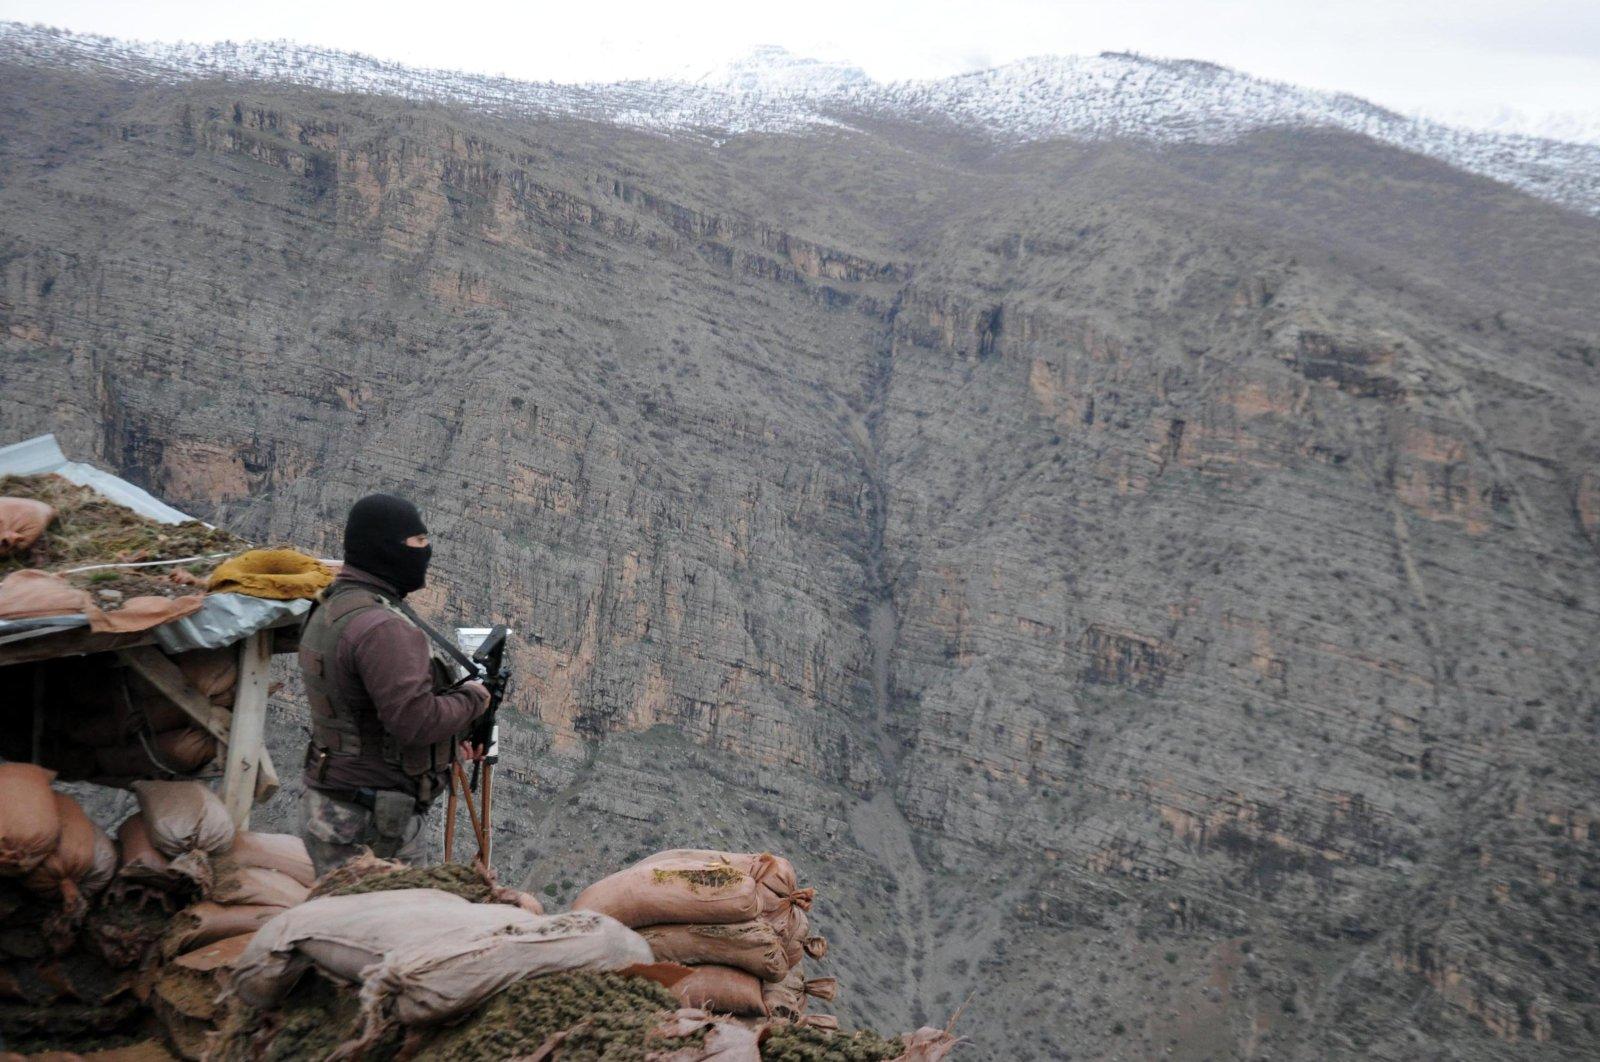 A Turkish soldier stands on guard near the Iraqi border in the mountainous region of Hakkari, southeastern Turkey. (AA File Photo)